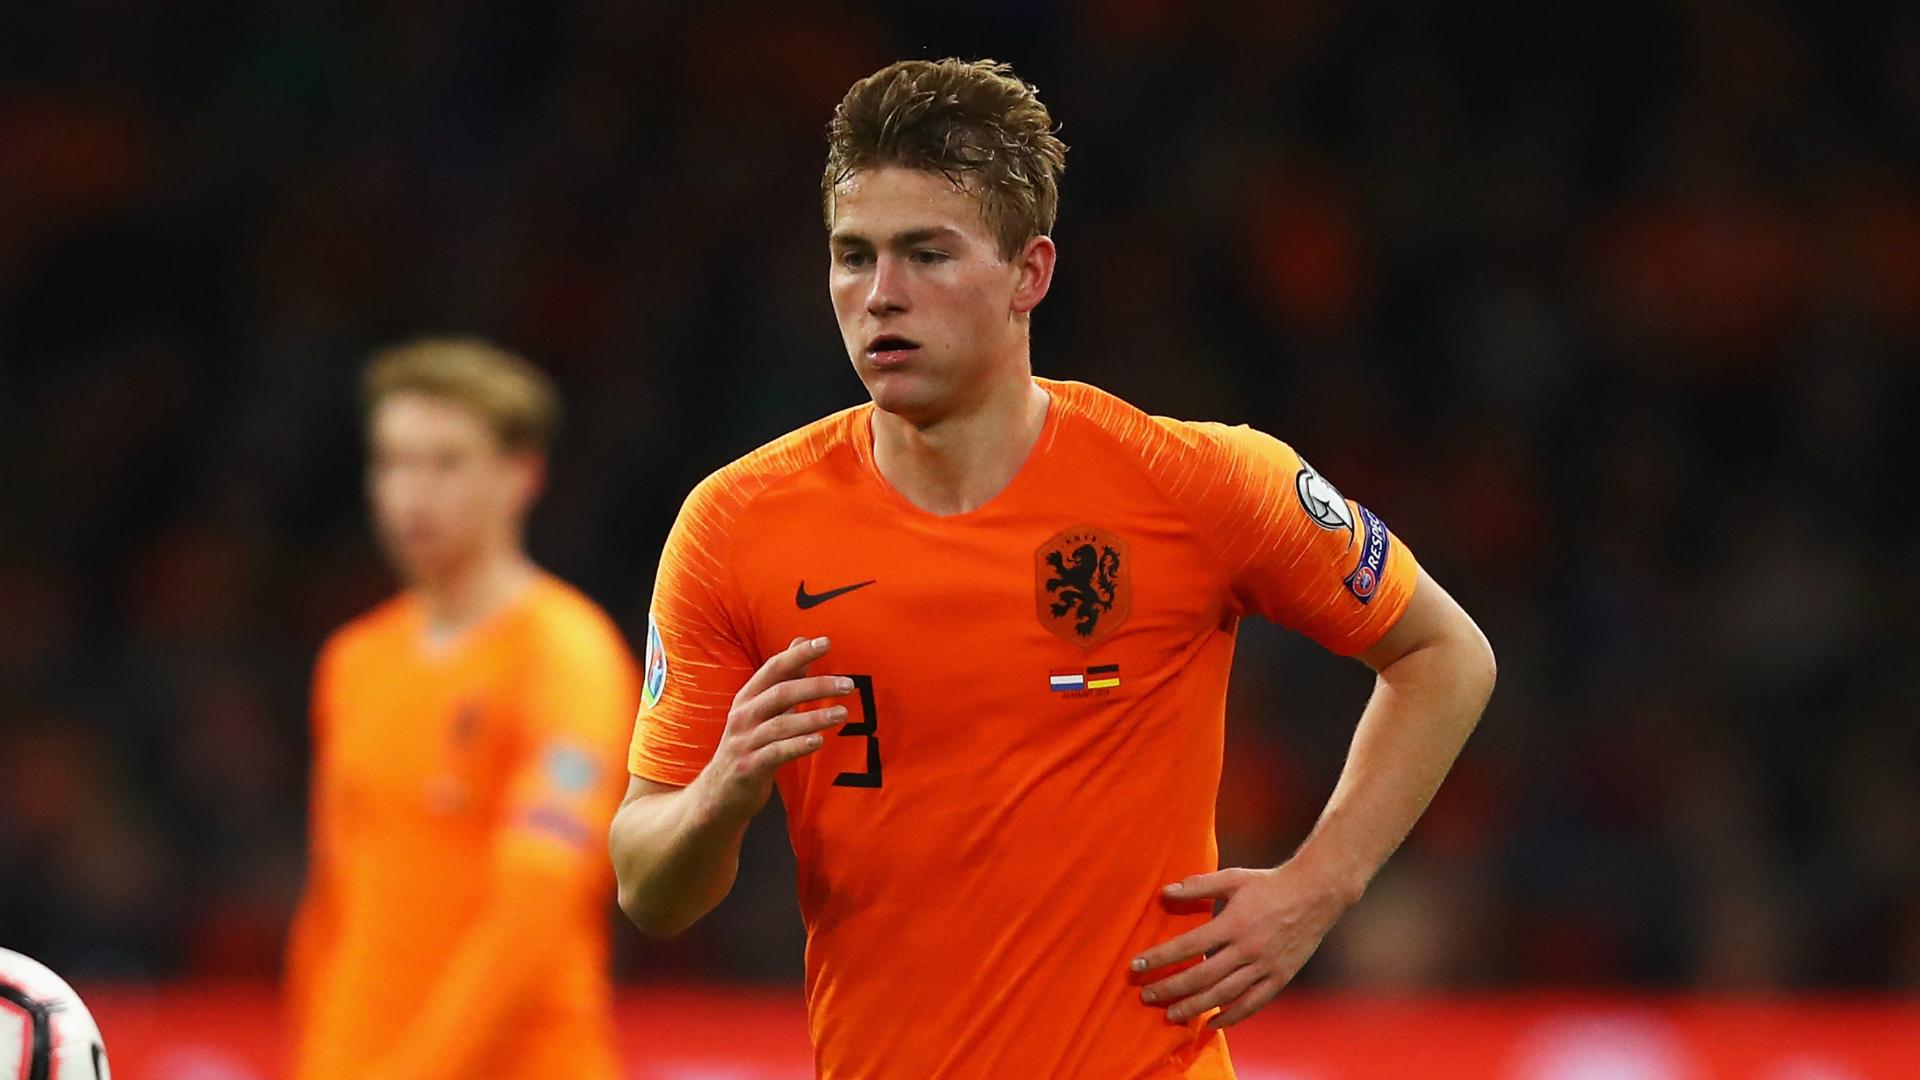 De Ligt out of Ajax tour as Juventus transfer beckons